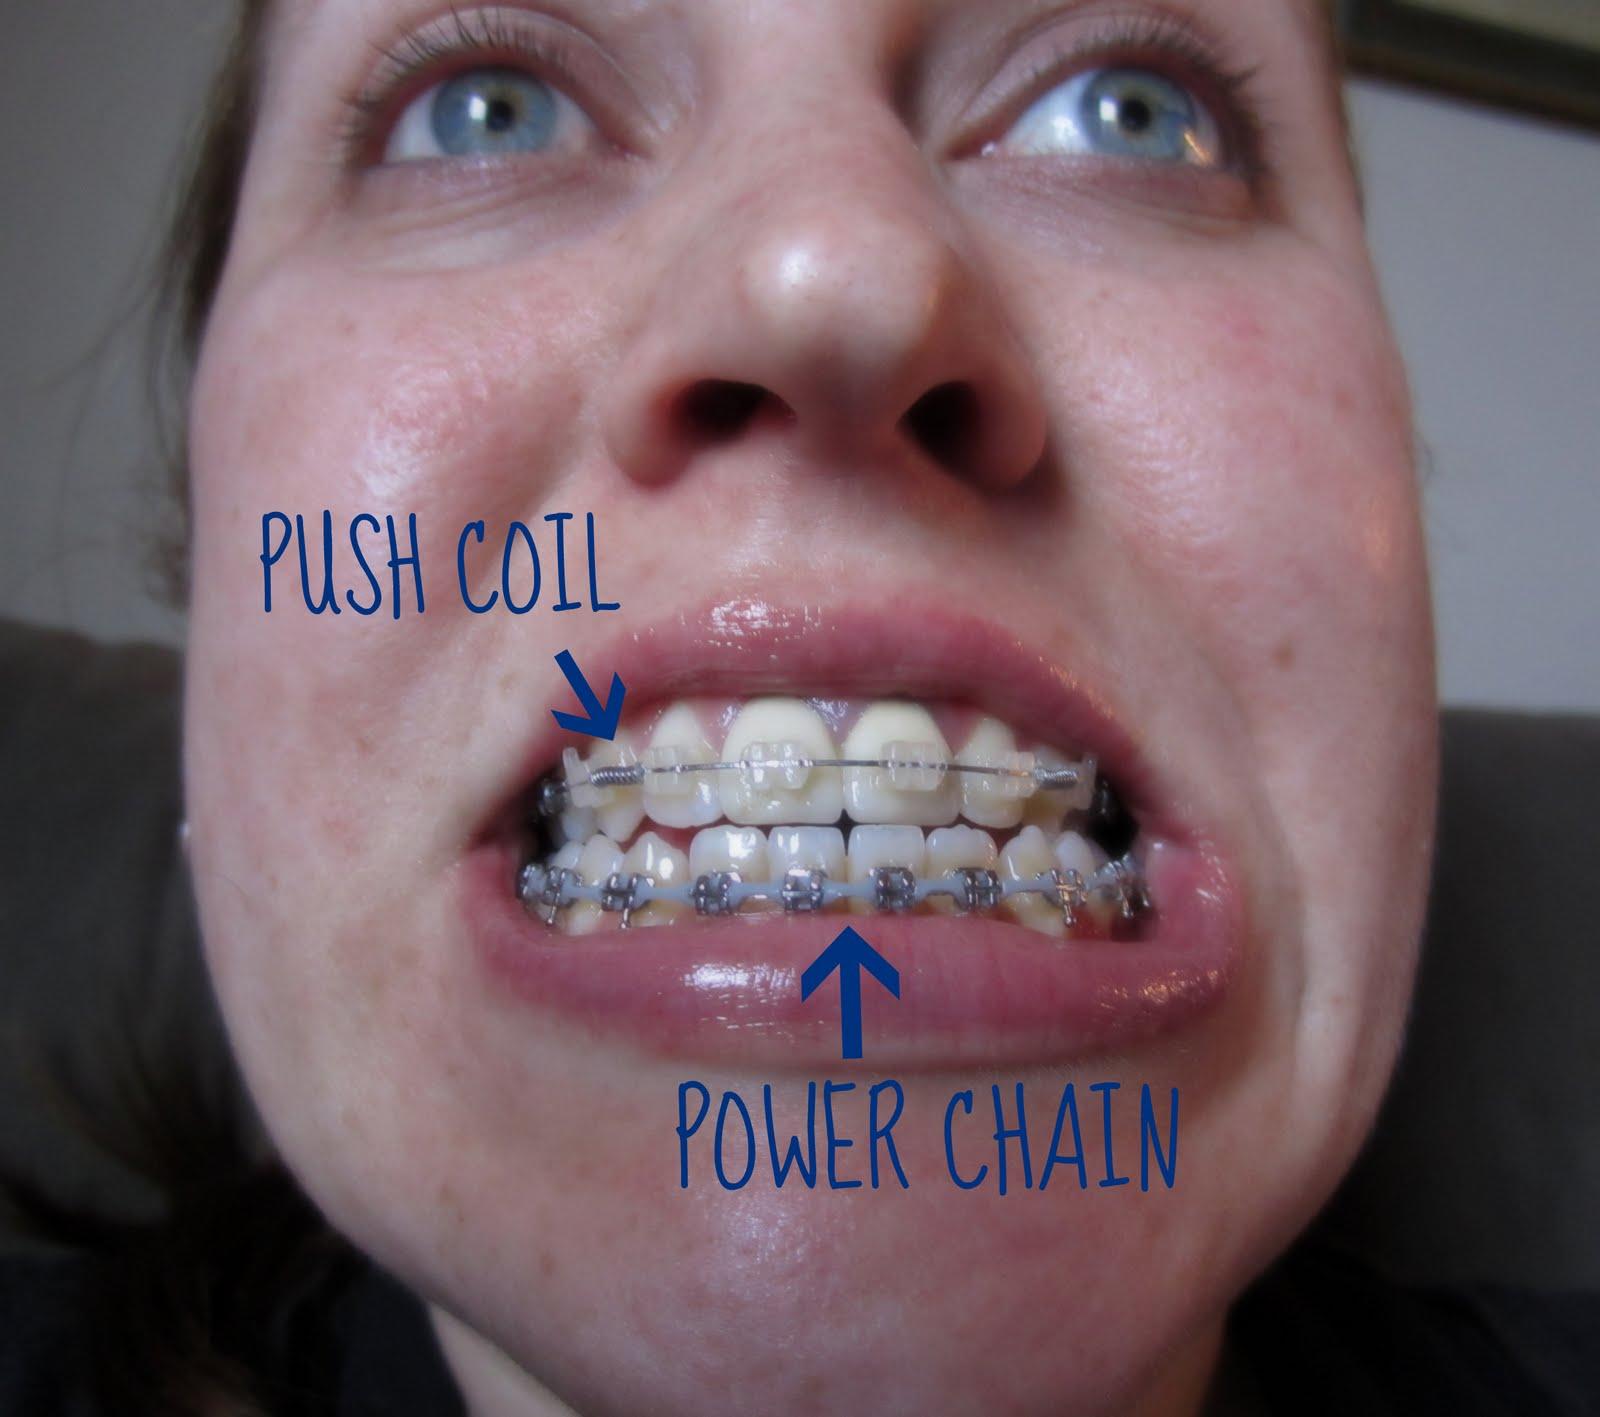 Wired jaw recipe on jaw clutch, jaw parts, jaw socket, jaw surgery procedures, jaw splint, jaw wired shut, jaw diagram, jaw suspension,